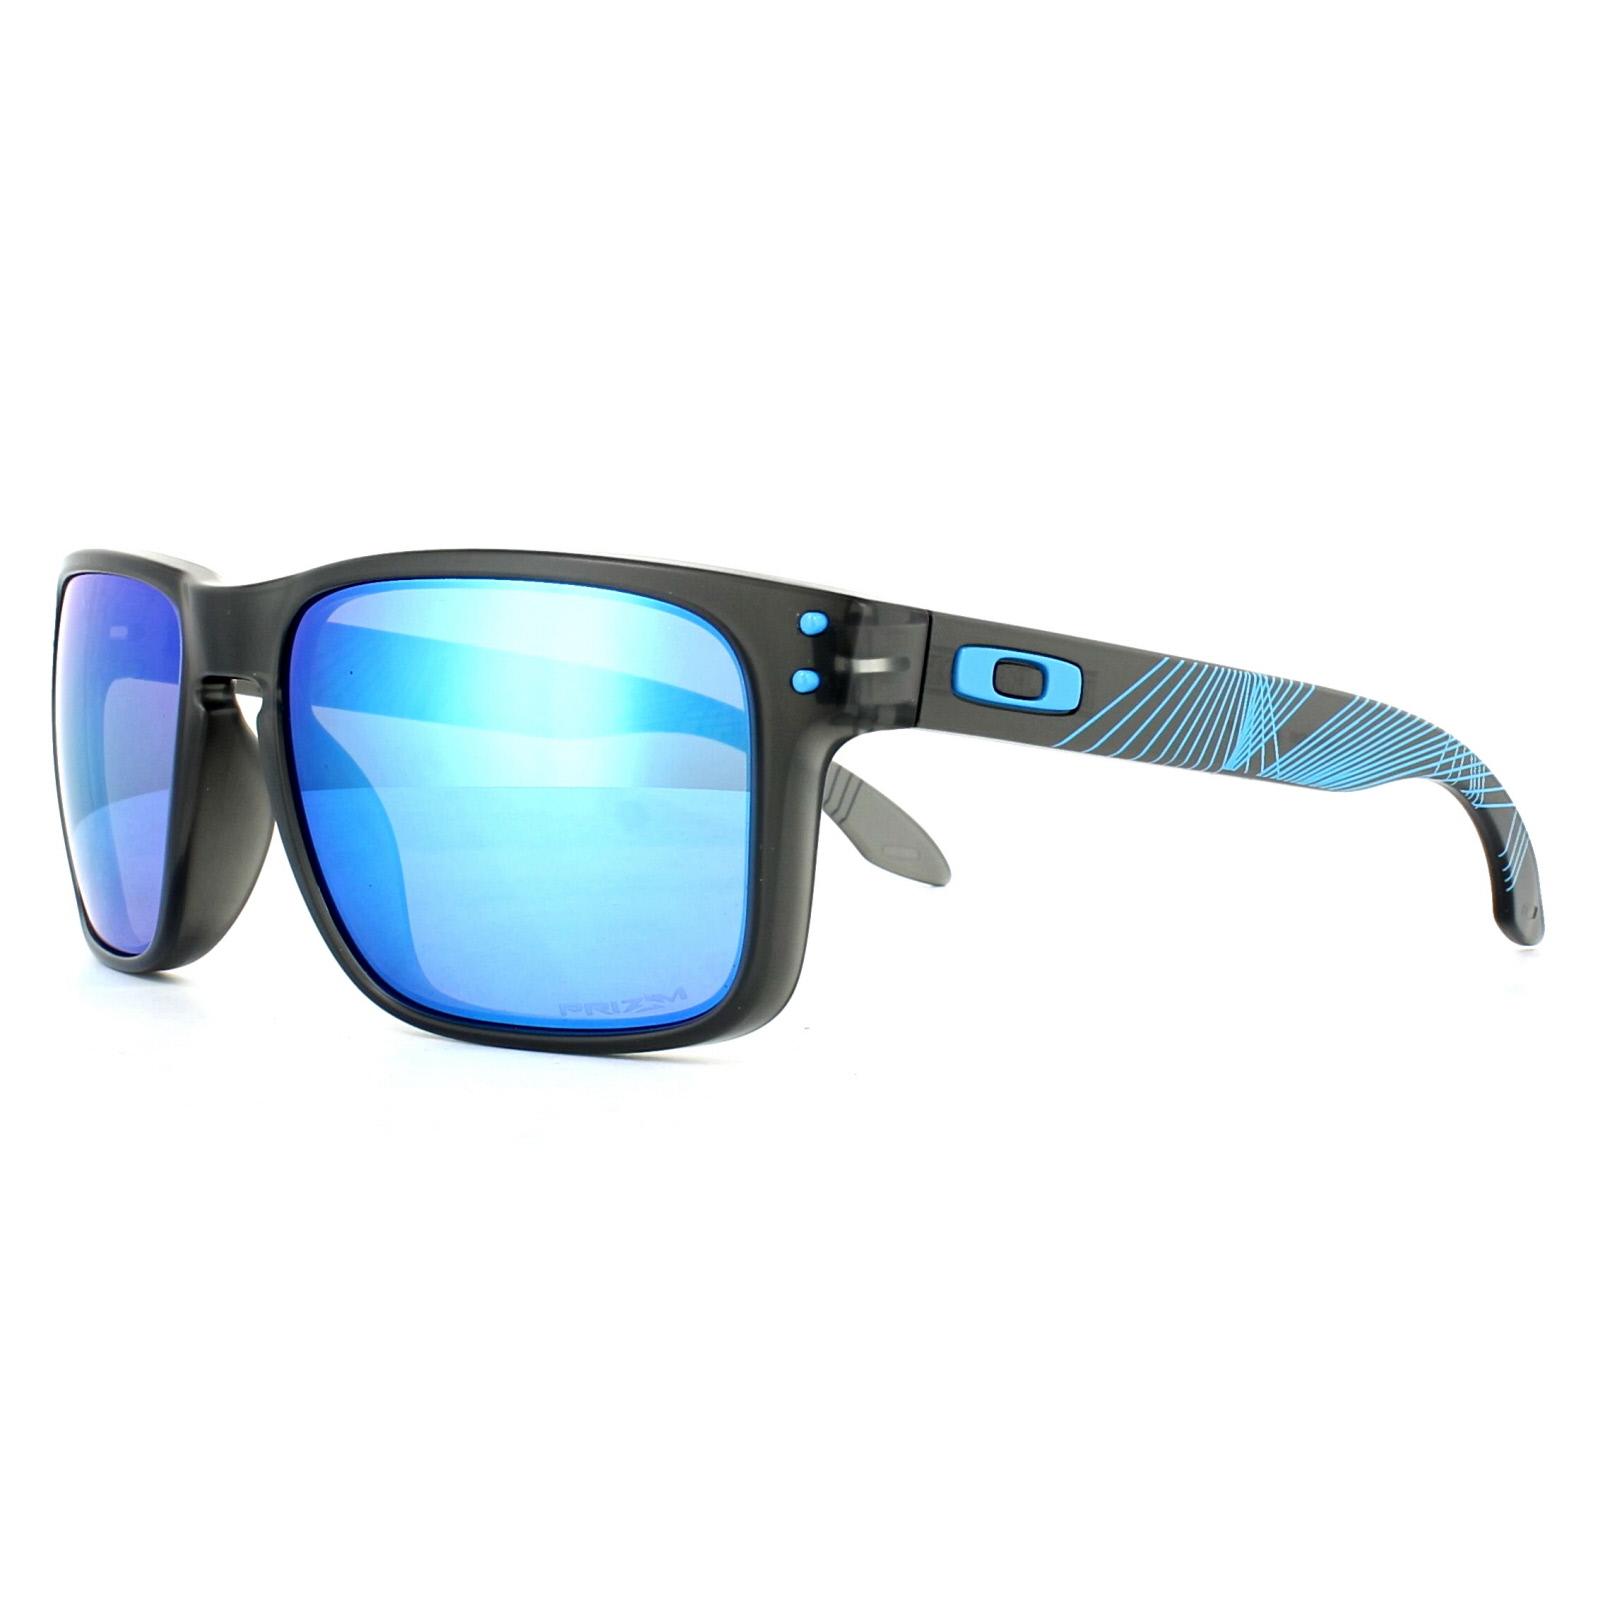 e8a117f0b5 Sentinel Oakley Sunglasses Holbrook OO9102-F2 Matt Grey Smoke Aero Prizm  Sapphire